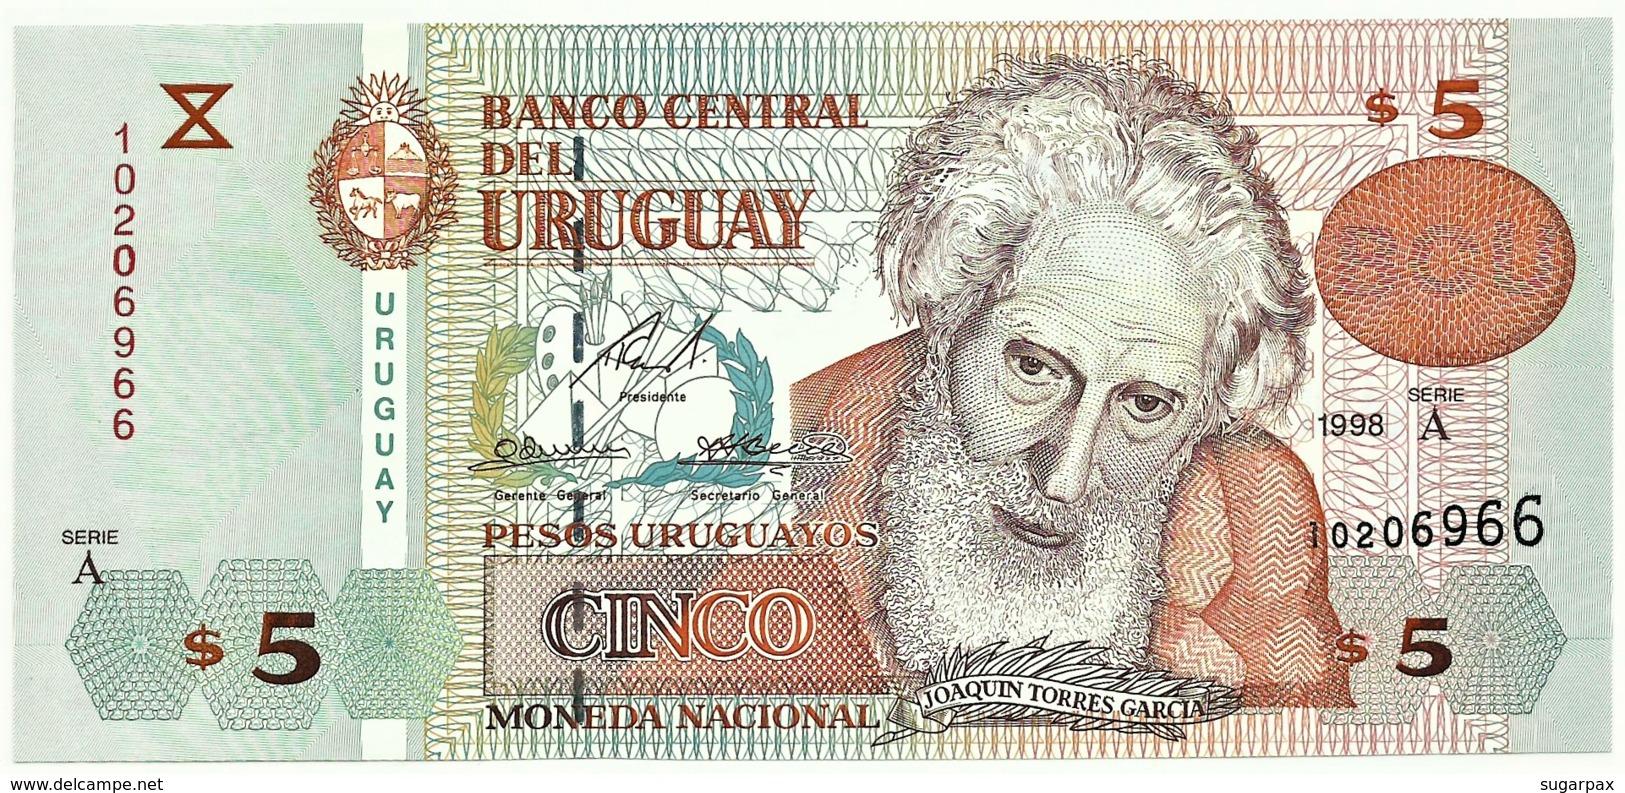 Uruguay - 5 Pesos Uruguayos - 1998 - Pick 80 - Serie A - Joaquin Torres Garcia - Uruguay